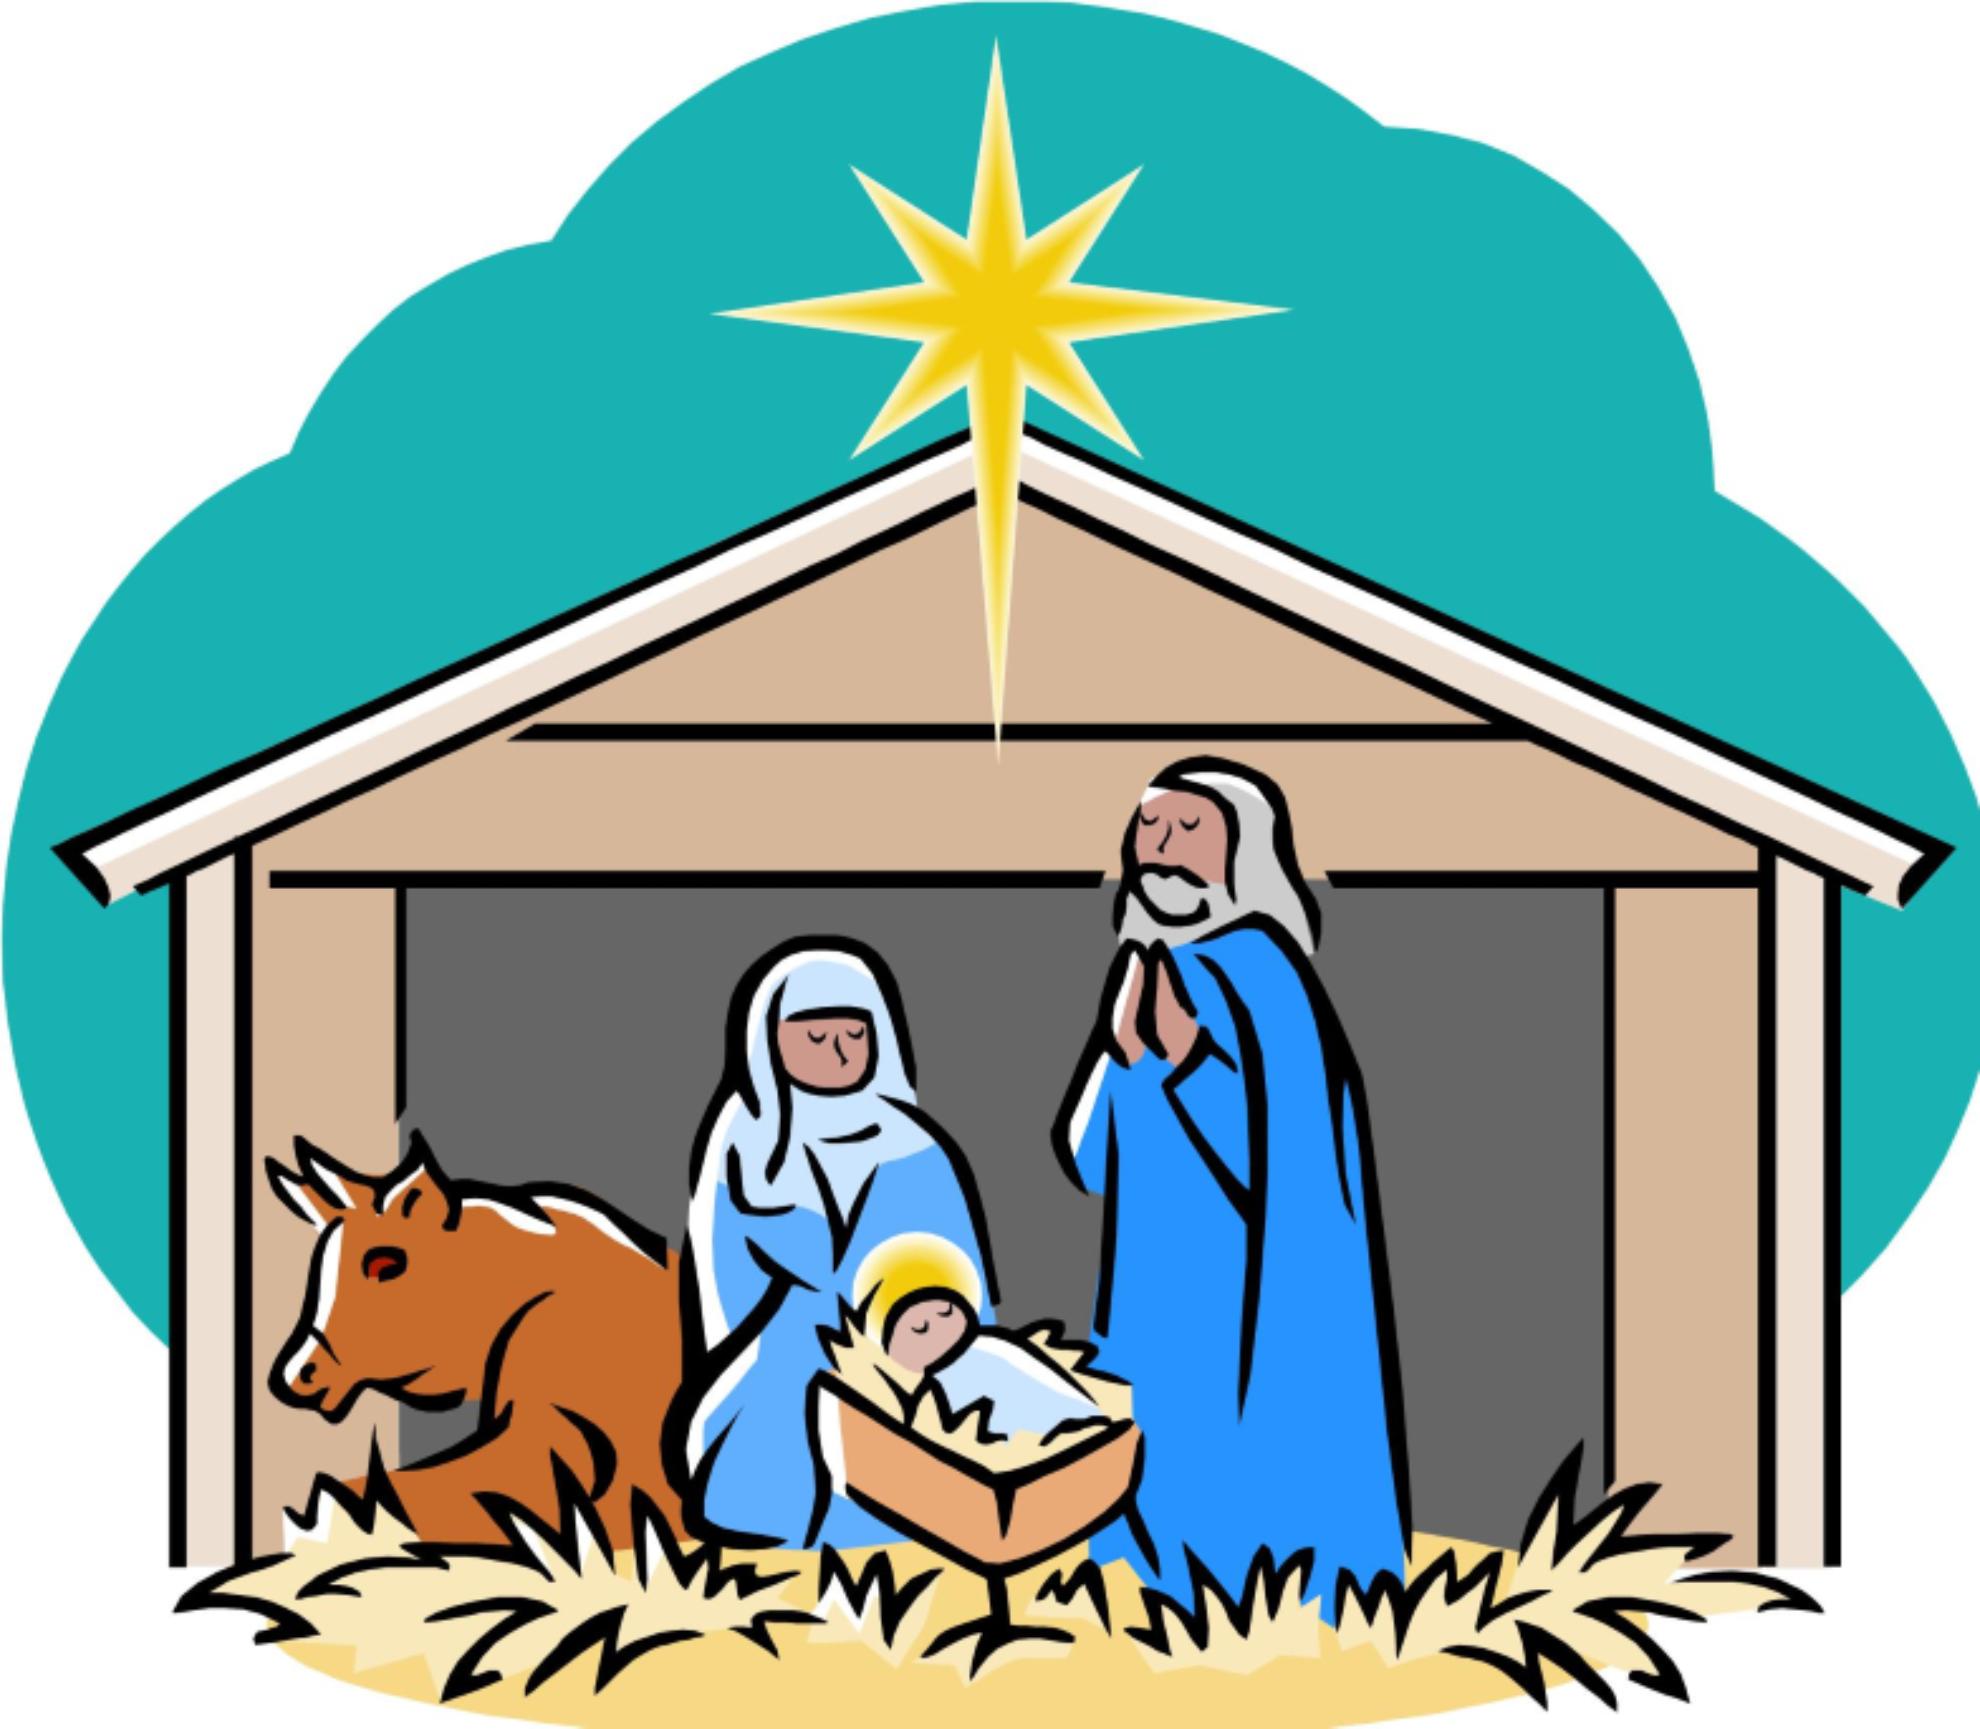 1980x1729 Clip Art Nativity Activities Merry Christmas Amp Happy New Year Arts